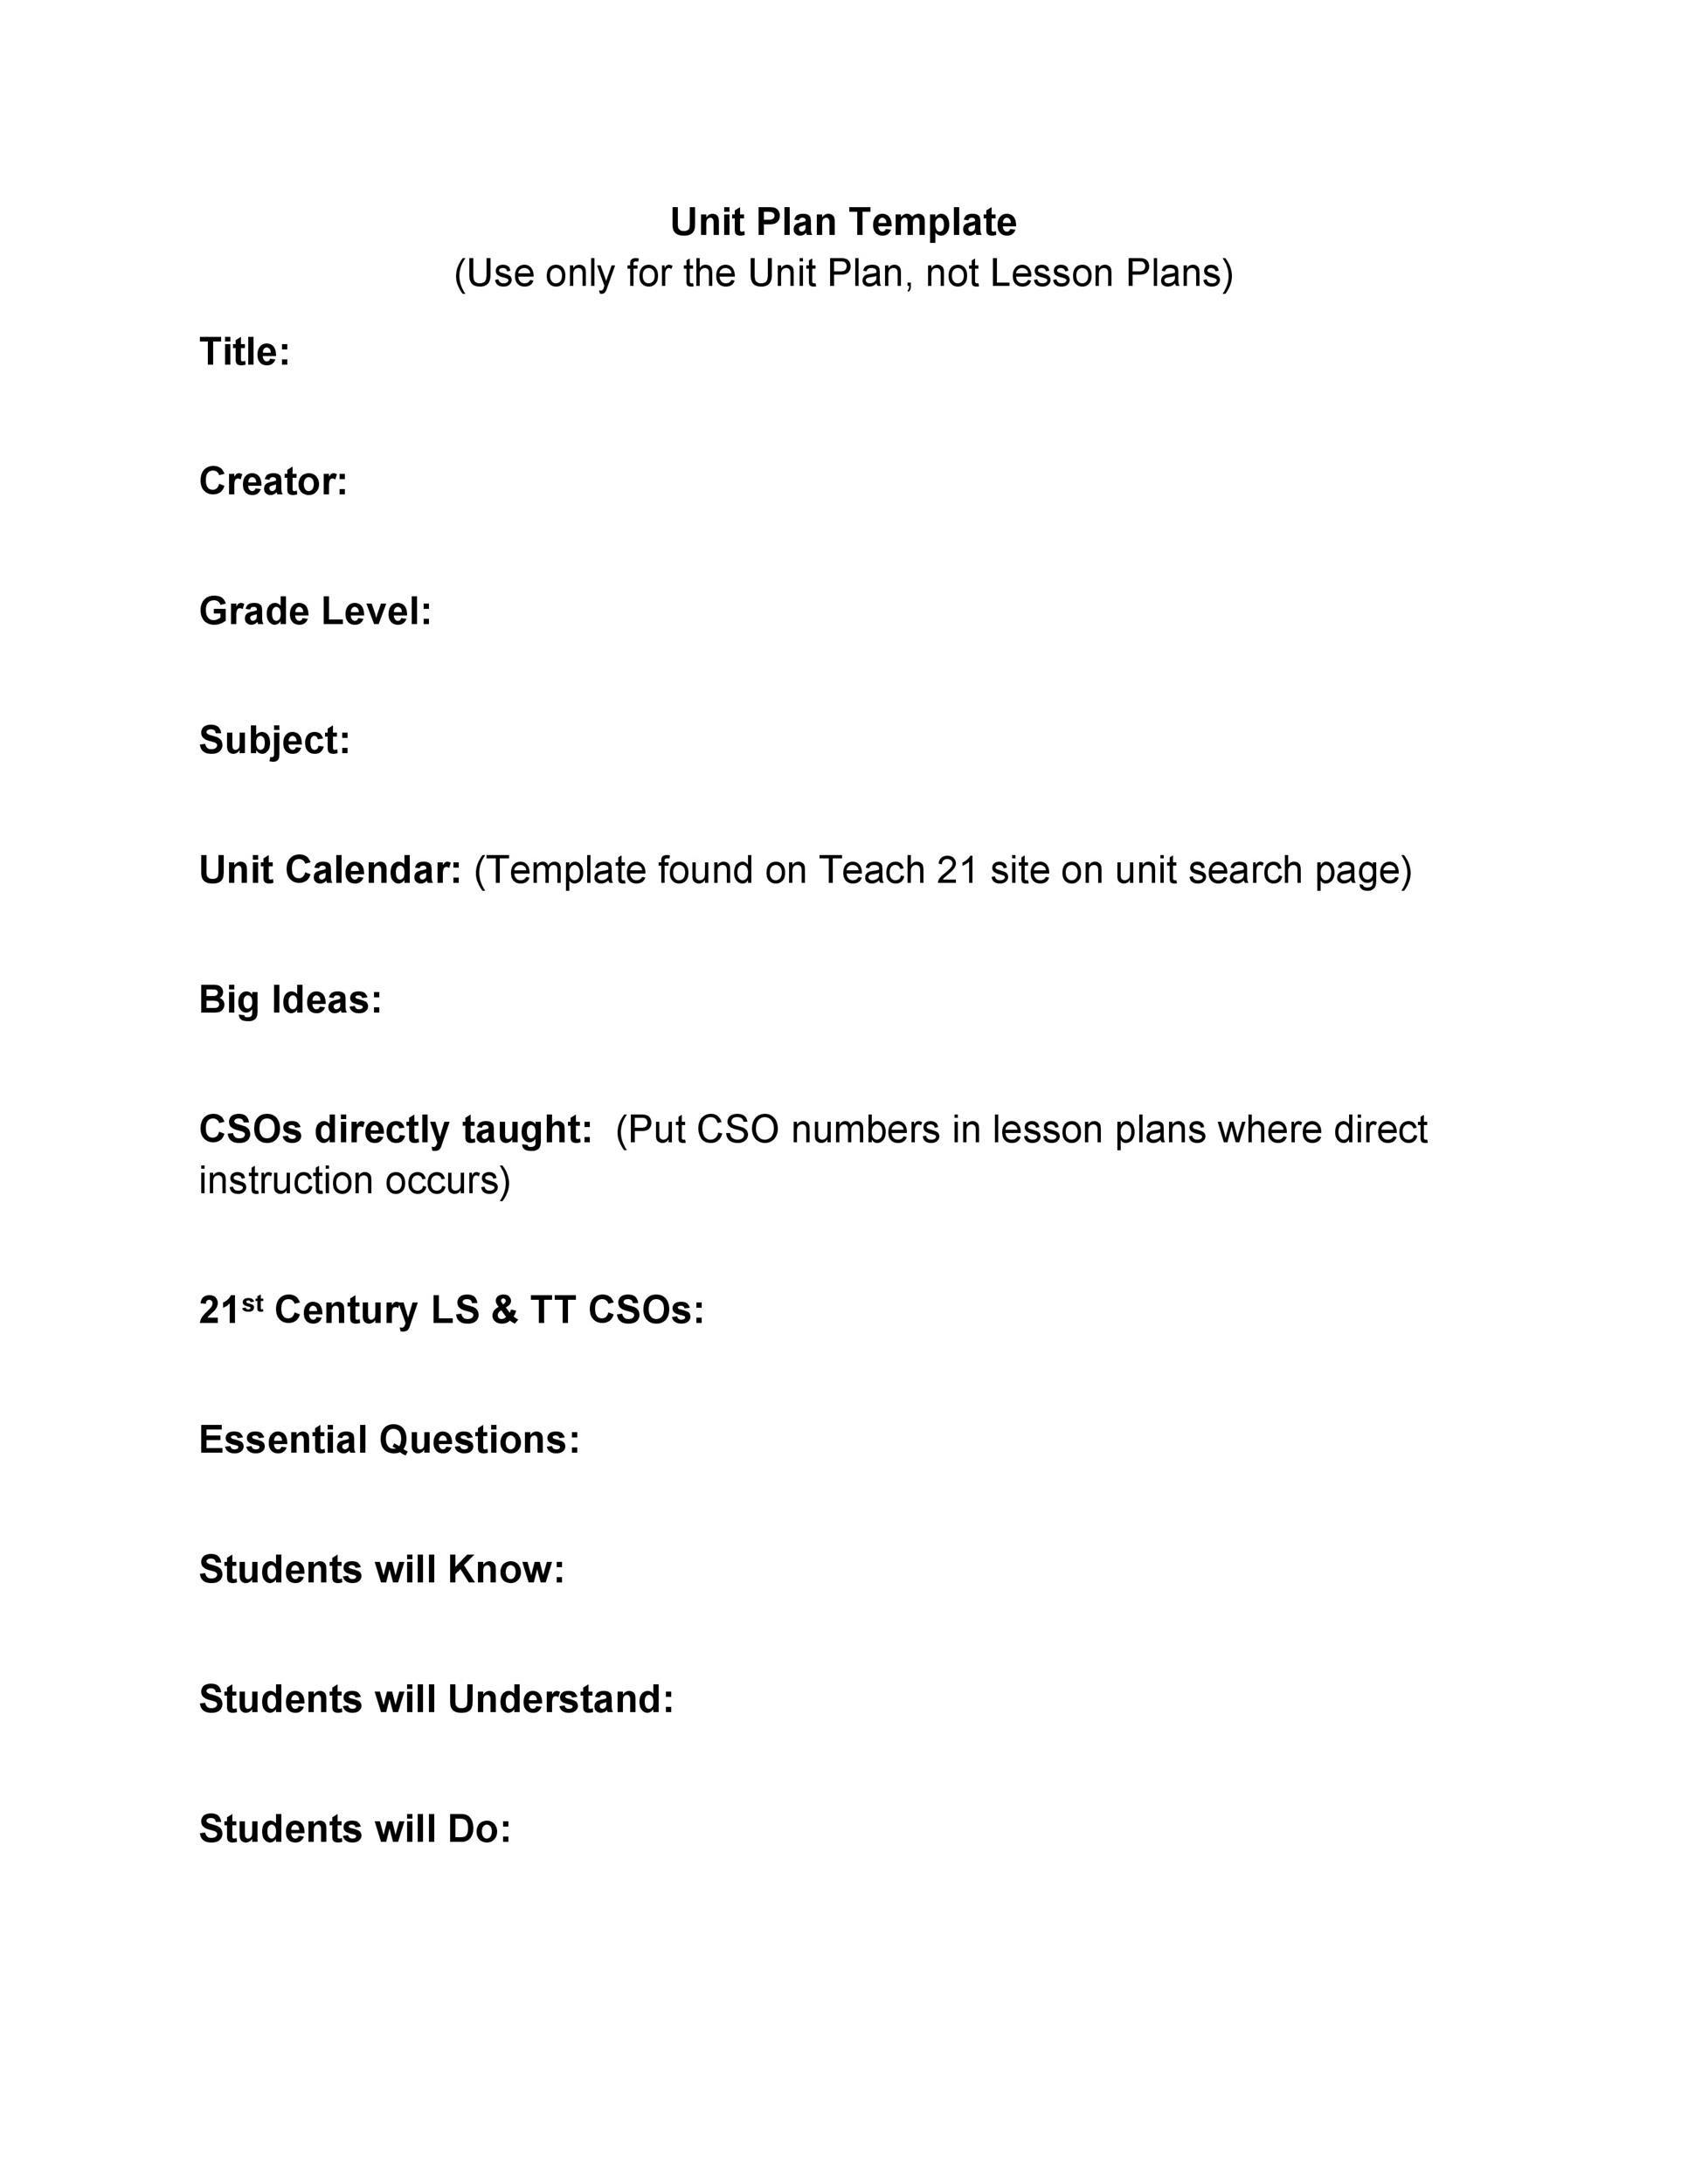 Free unit plan template 01